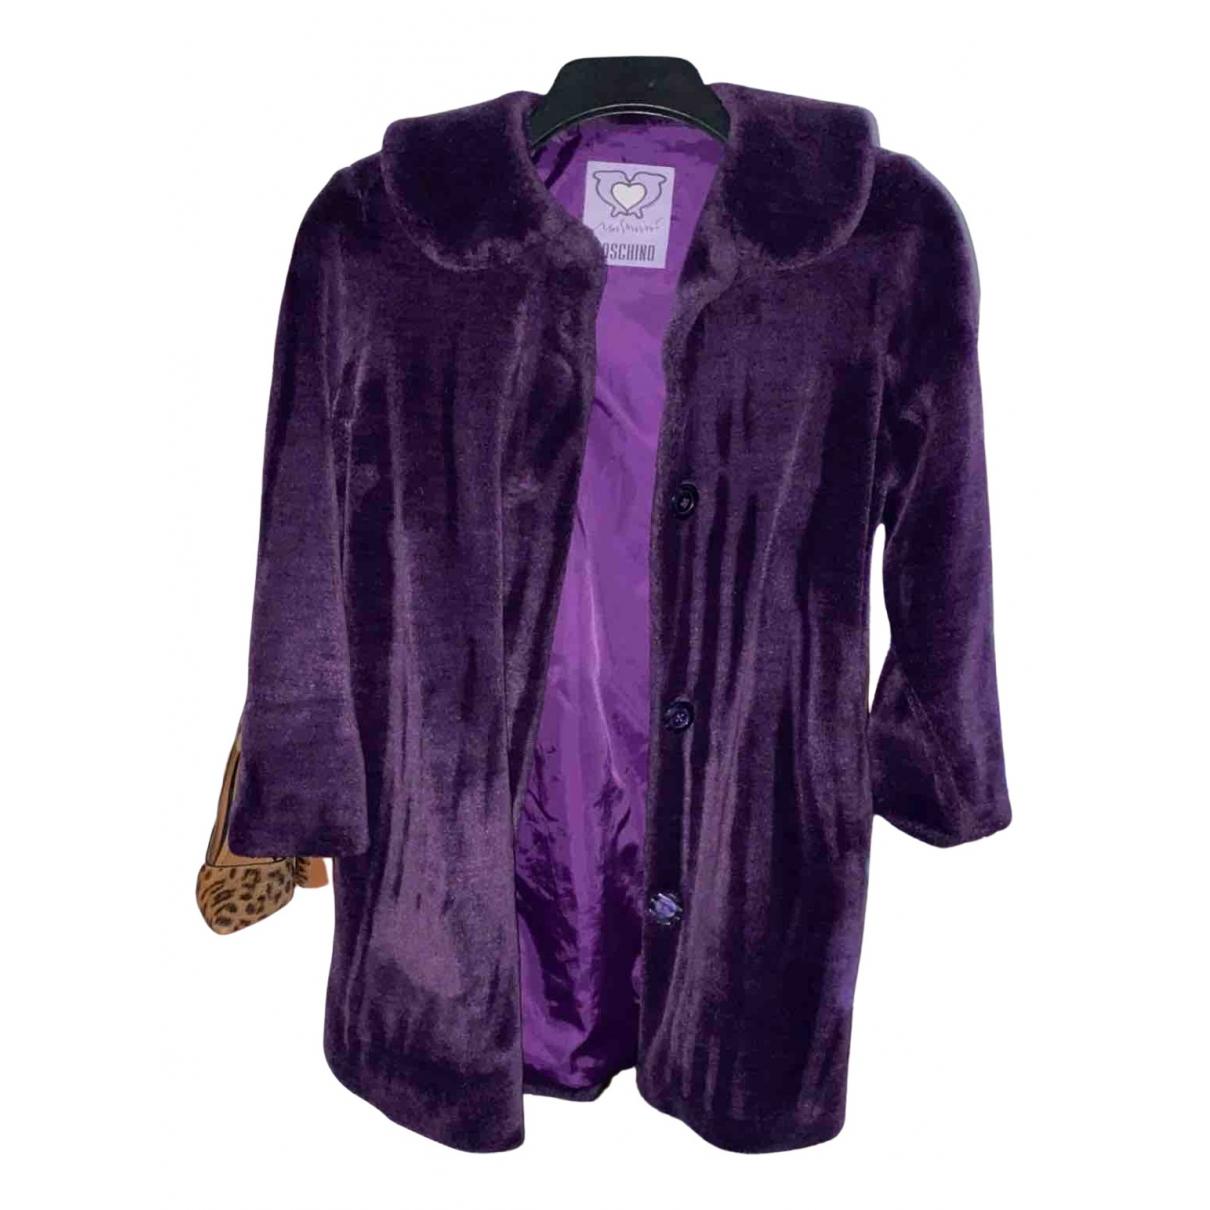 Moschino N Burgundy Faux fur jacket & coat for Kids 12 years - XS UK